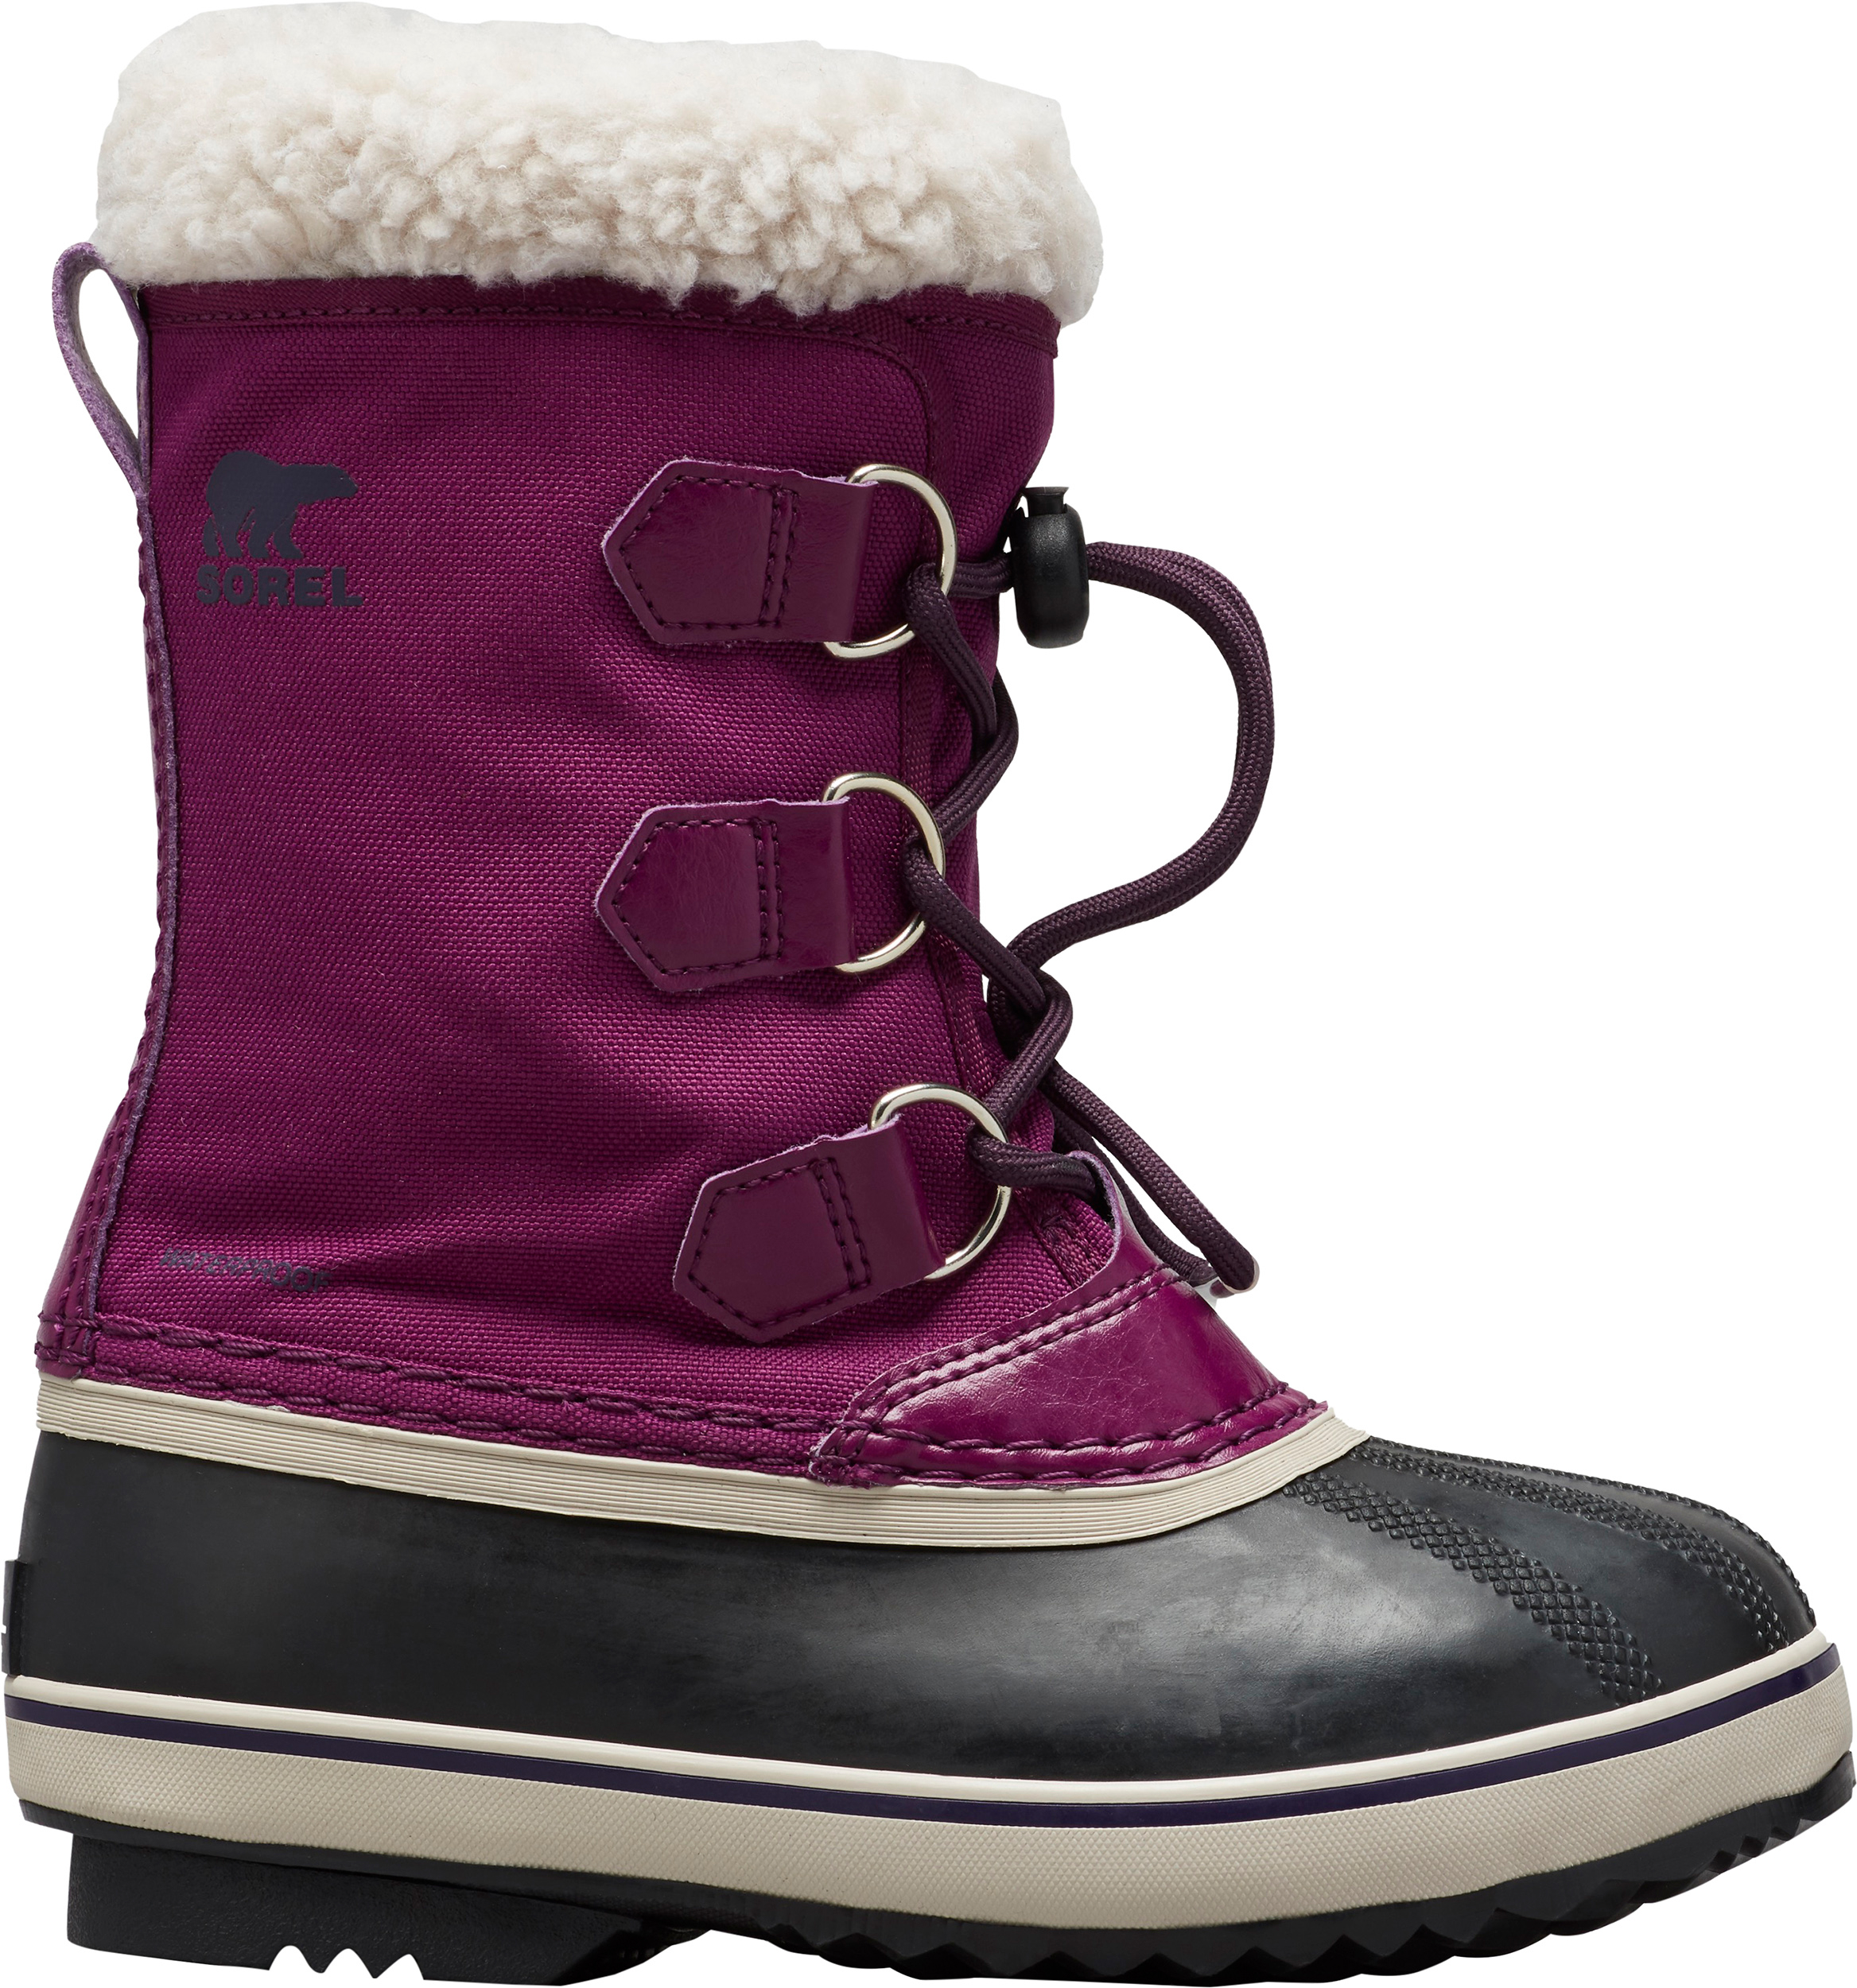 db3ddf848b0 Sorel Yoot Pac Nylon Winter Boots - Youths | MEC